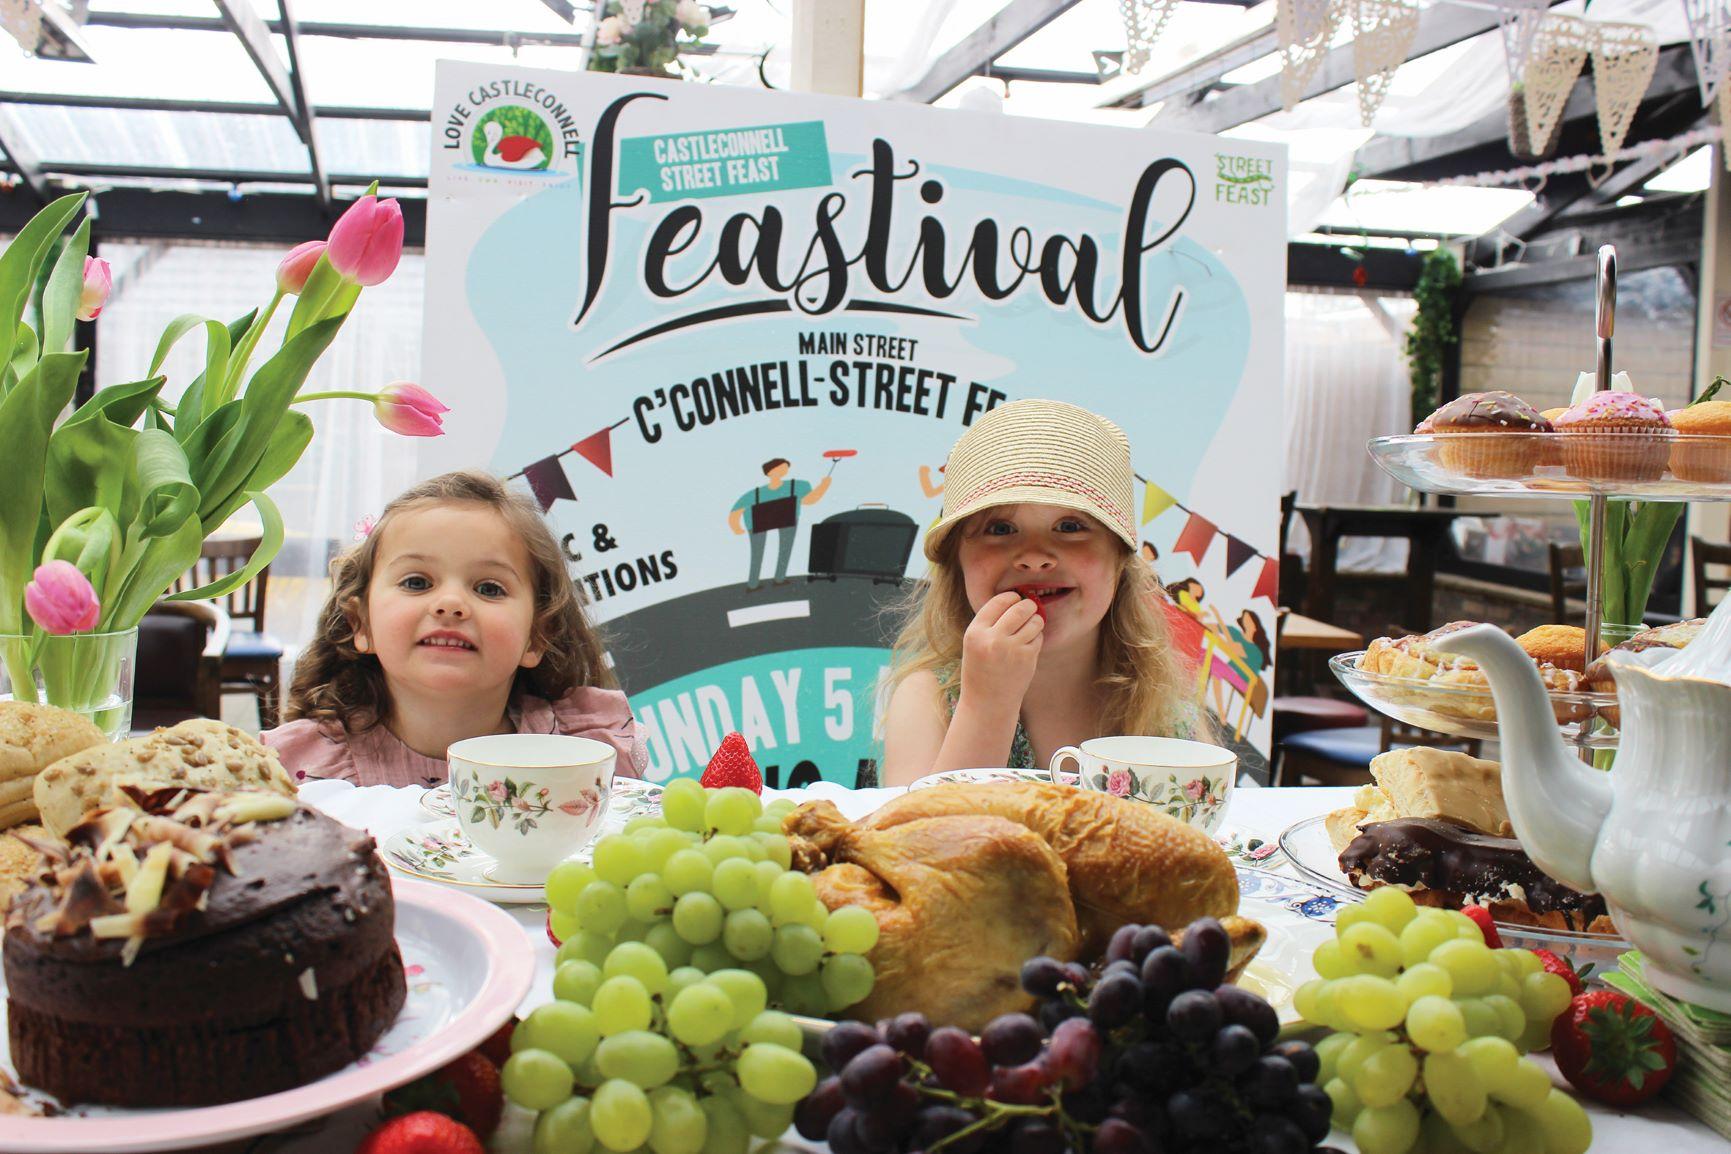 Castleconnell Street Feastival 2019